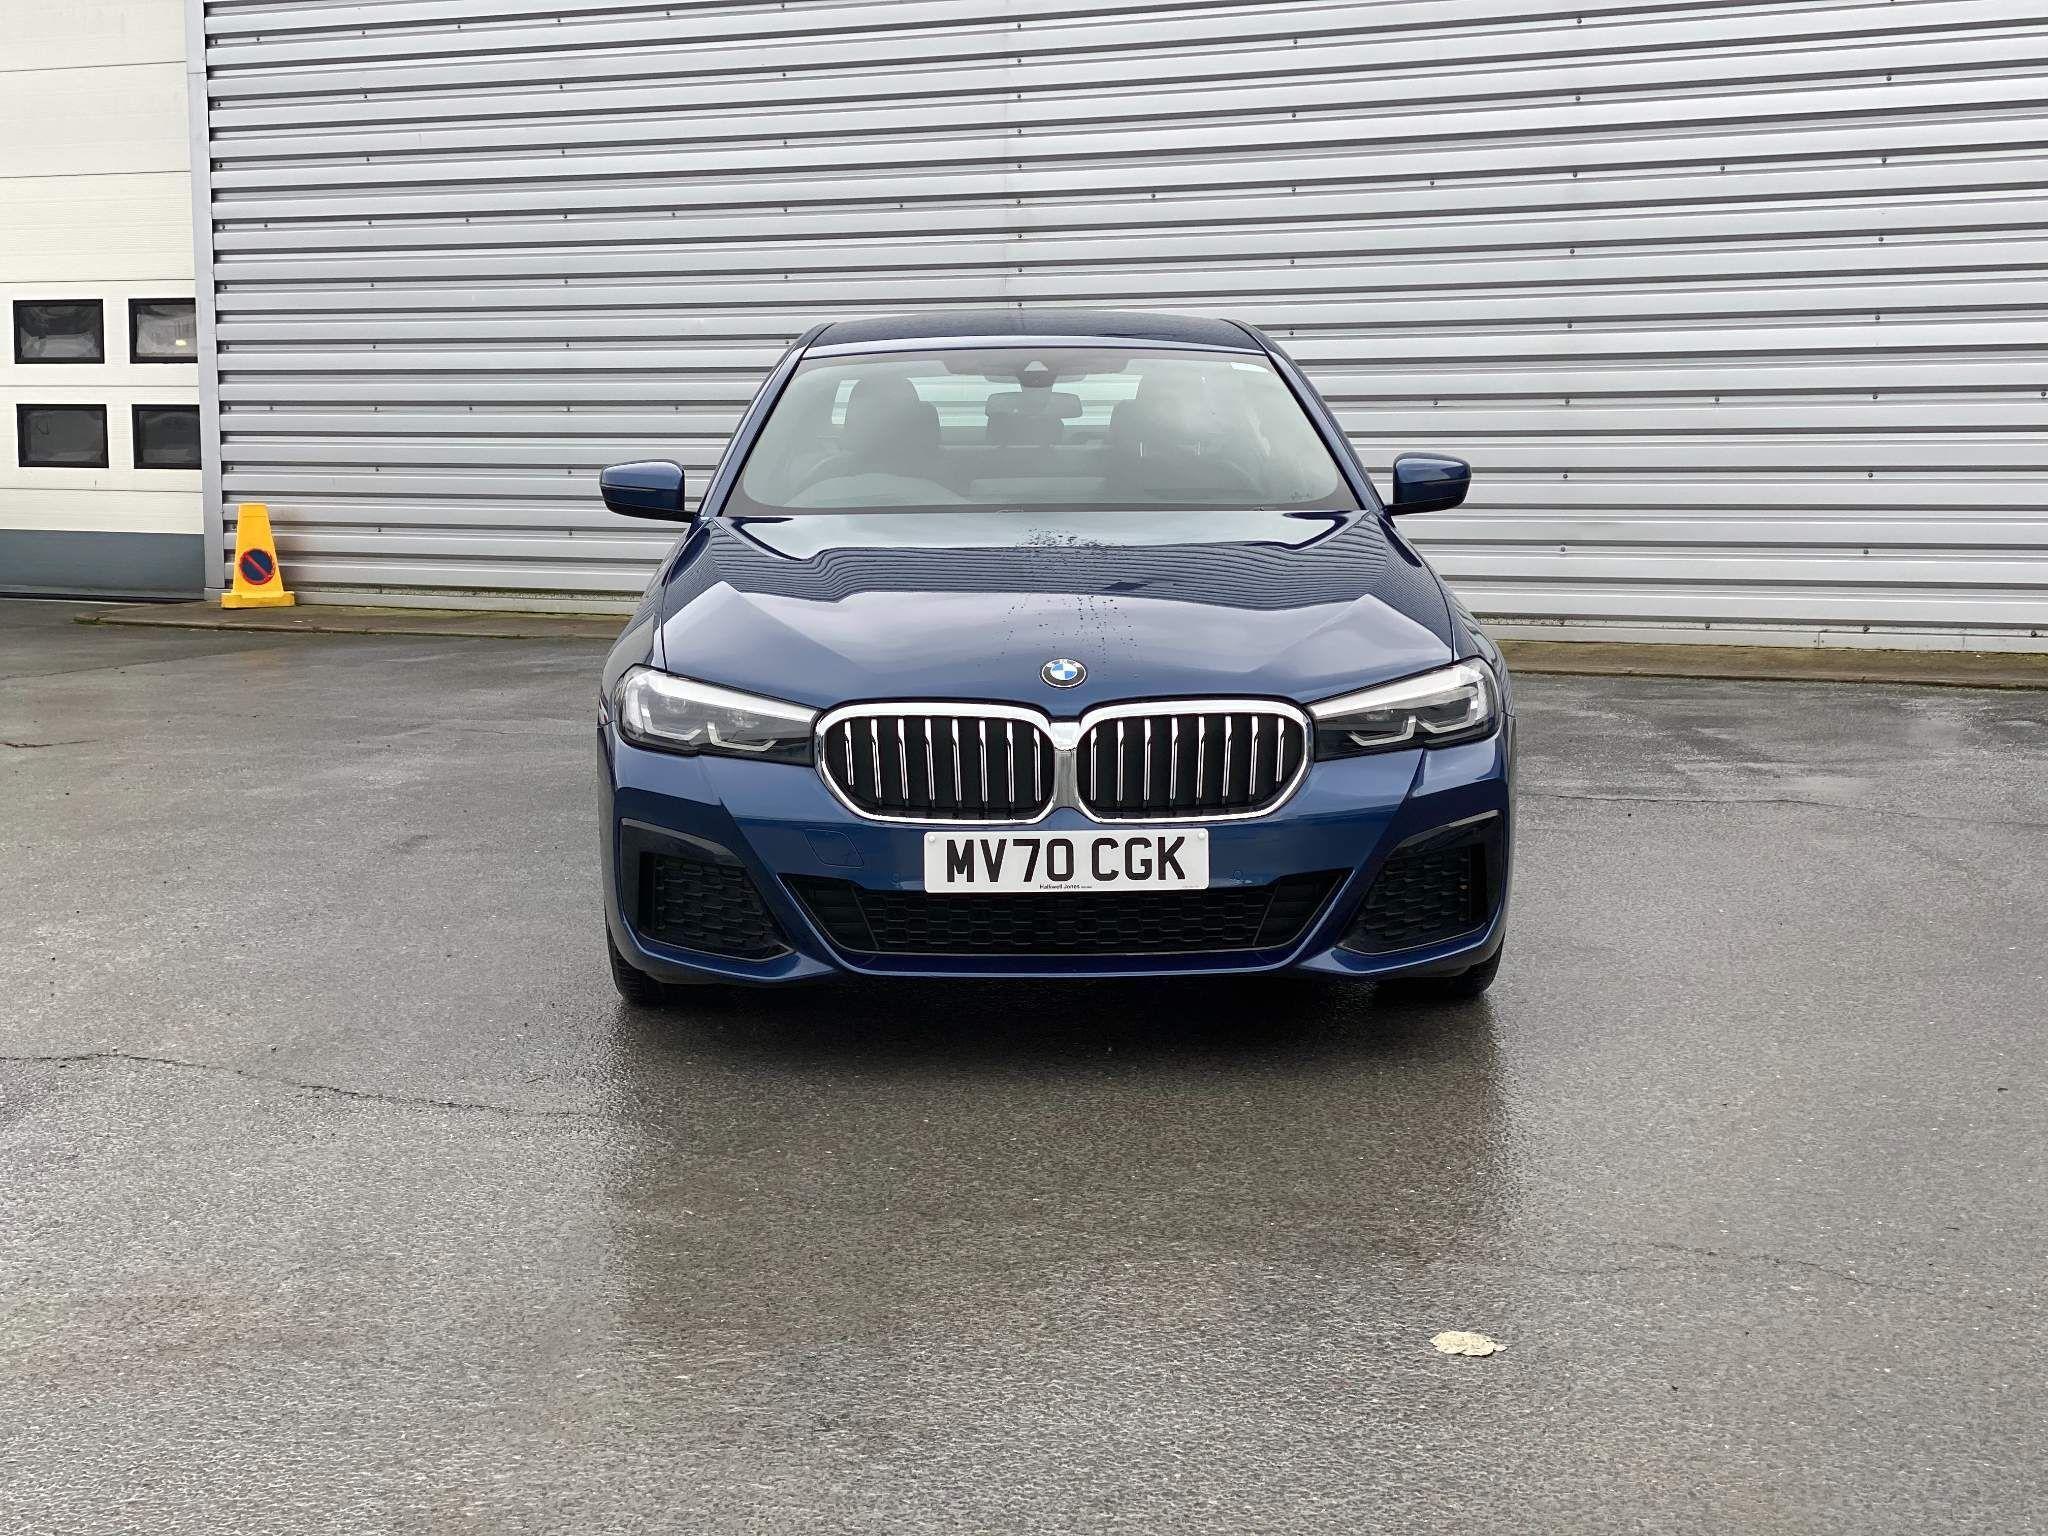 Image 4 - BMW 530d xDrive M Sport Saloon (MV70CGK)